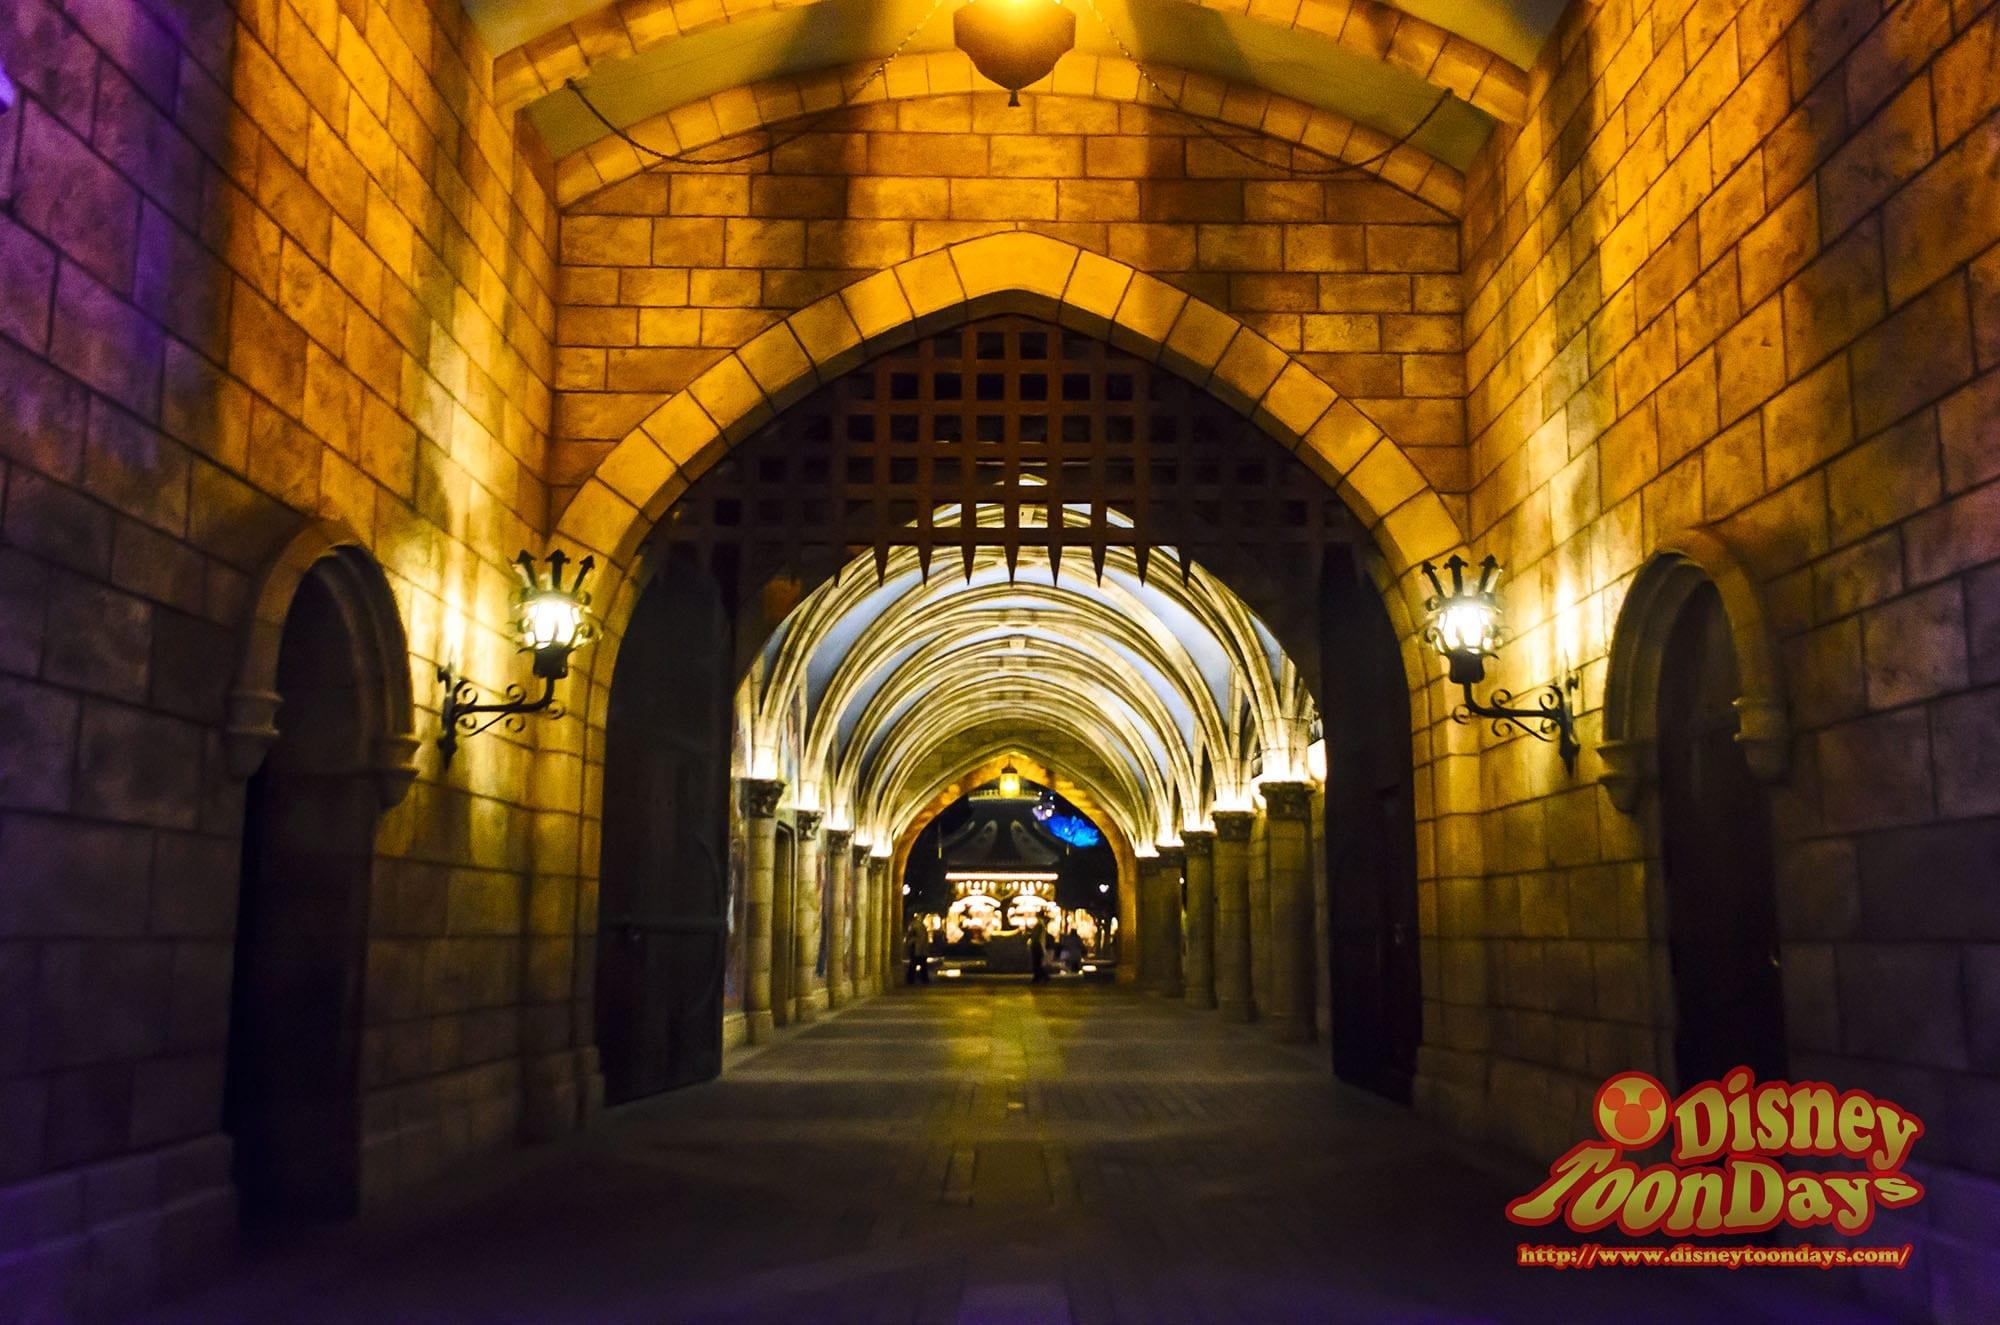 TDL ディズニーJCBカード5周年記念スペシャルナイトat東京ディズニーランド プライベートイブニングパーティー ファンタジーランド 風景